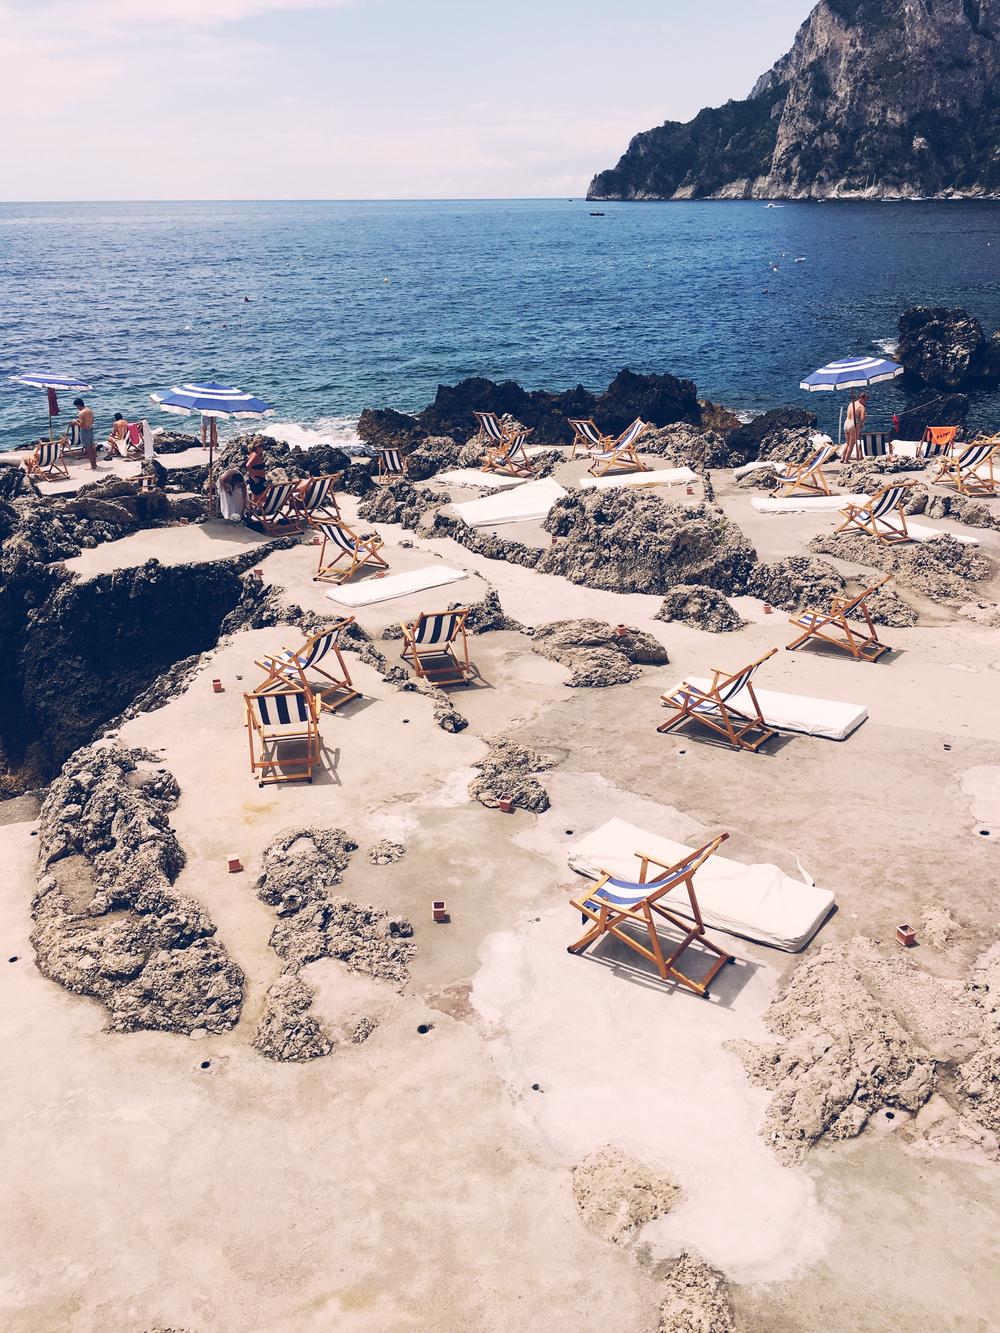 The beach at - La Fontelina